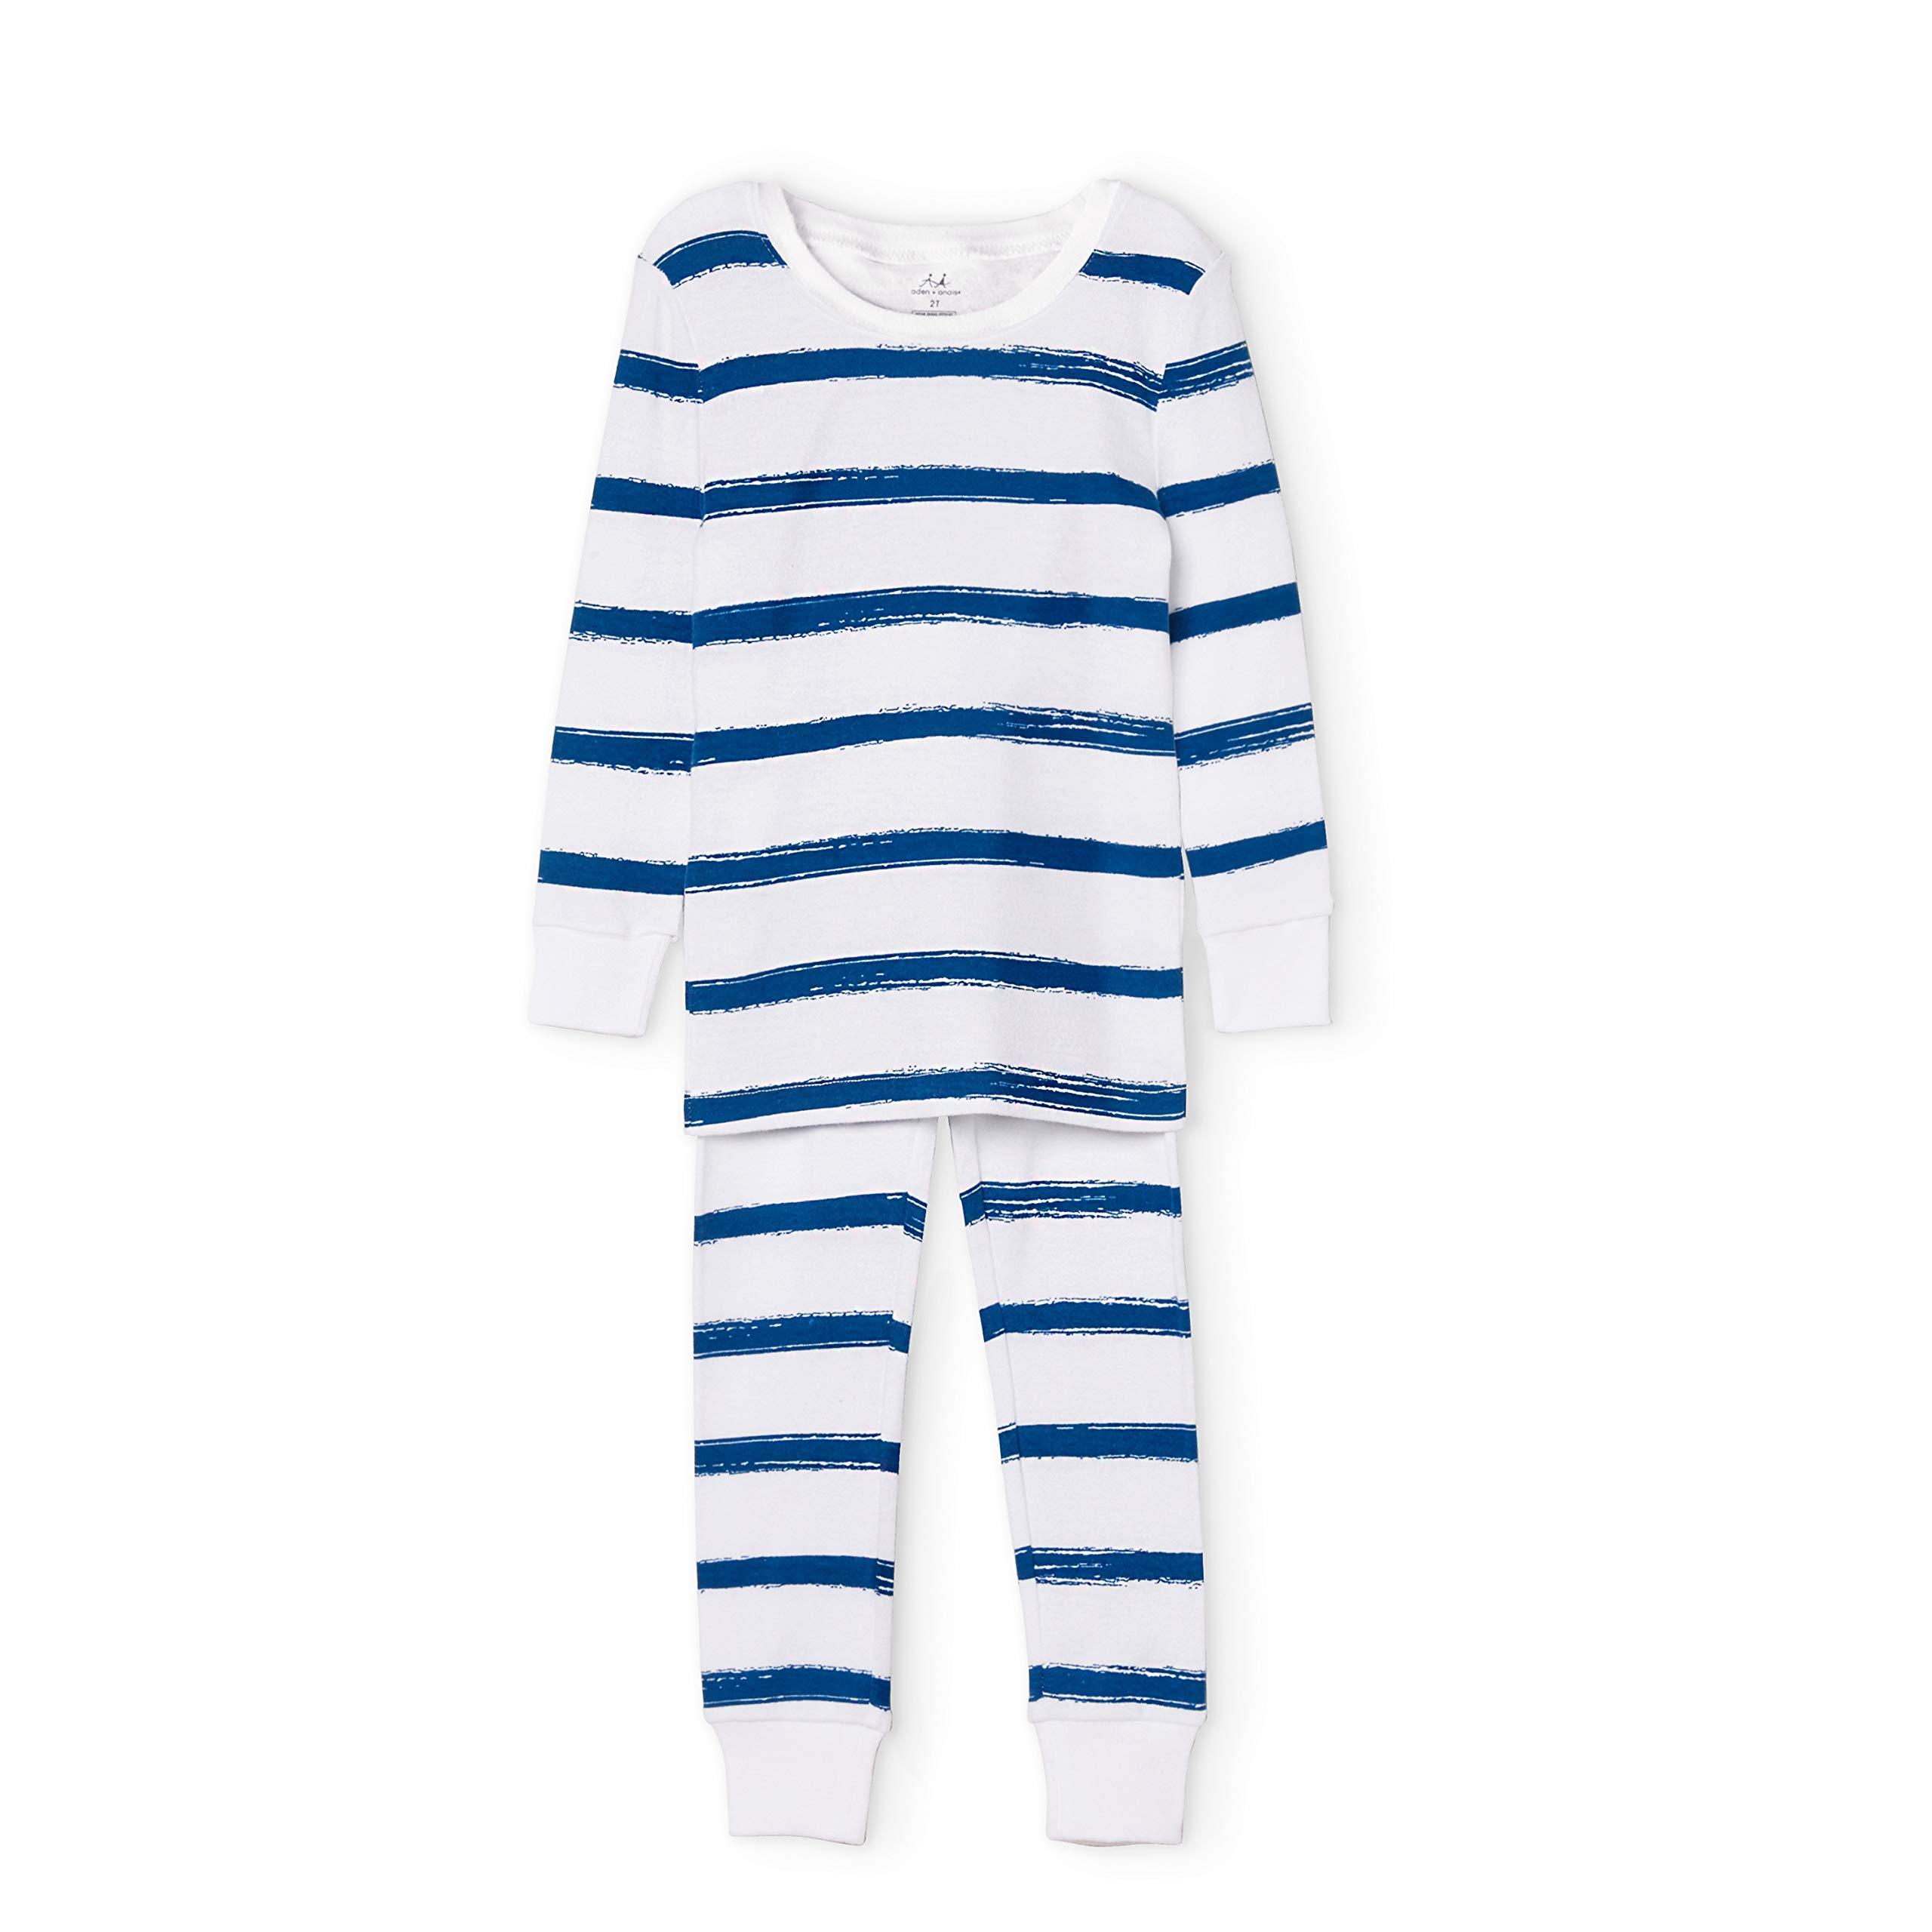 aden + anais Kids' Toddler Cotton Pajamas, Navy Stripe, 3T